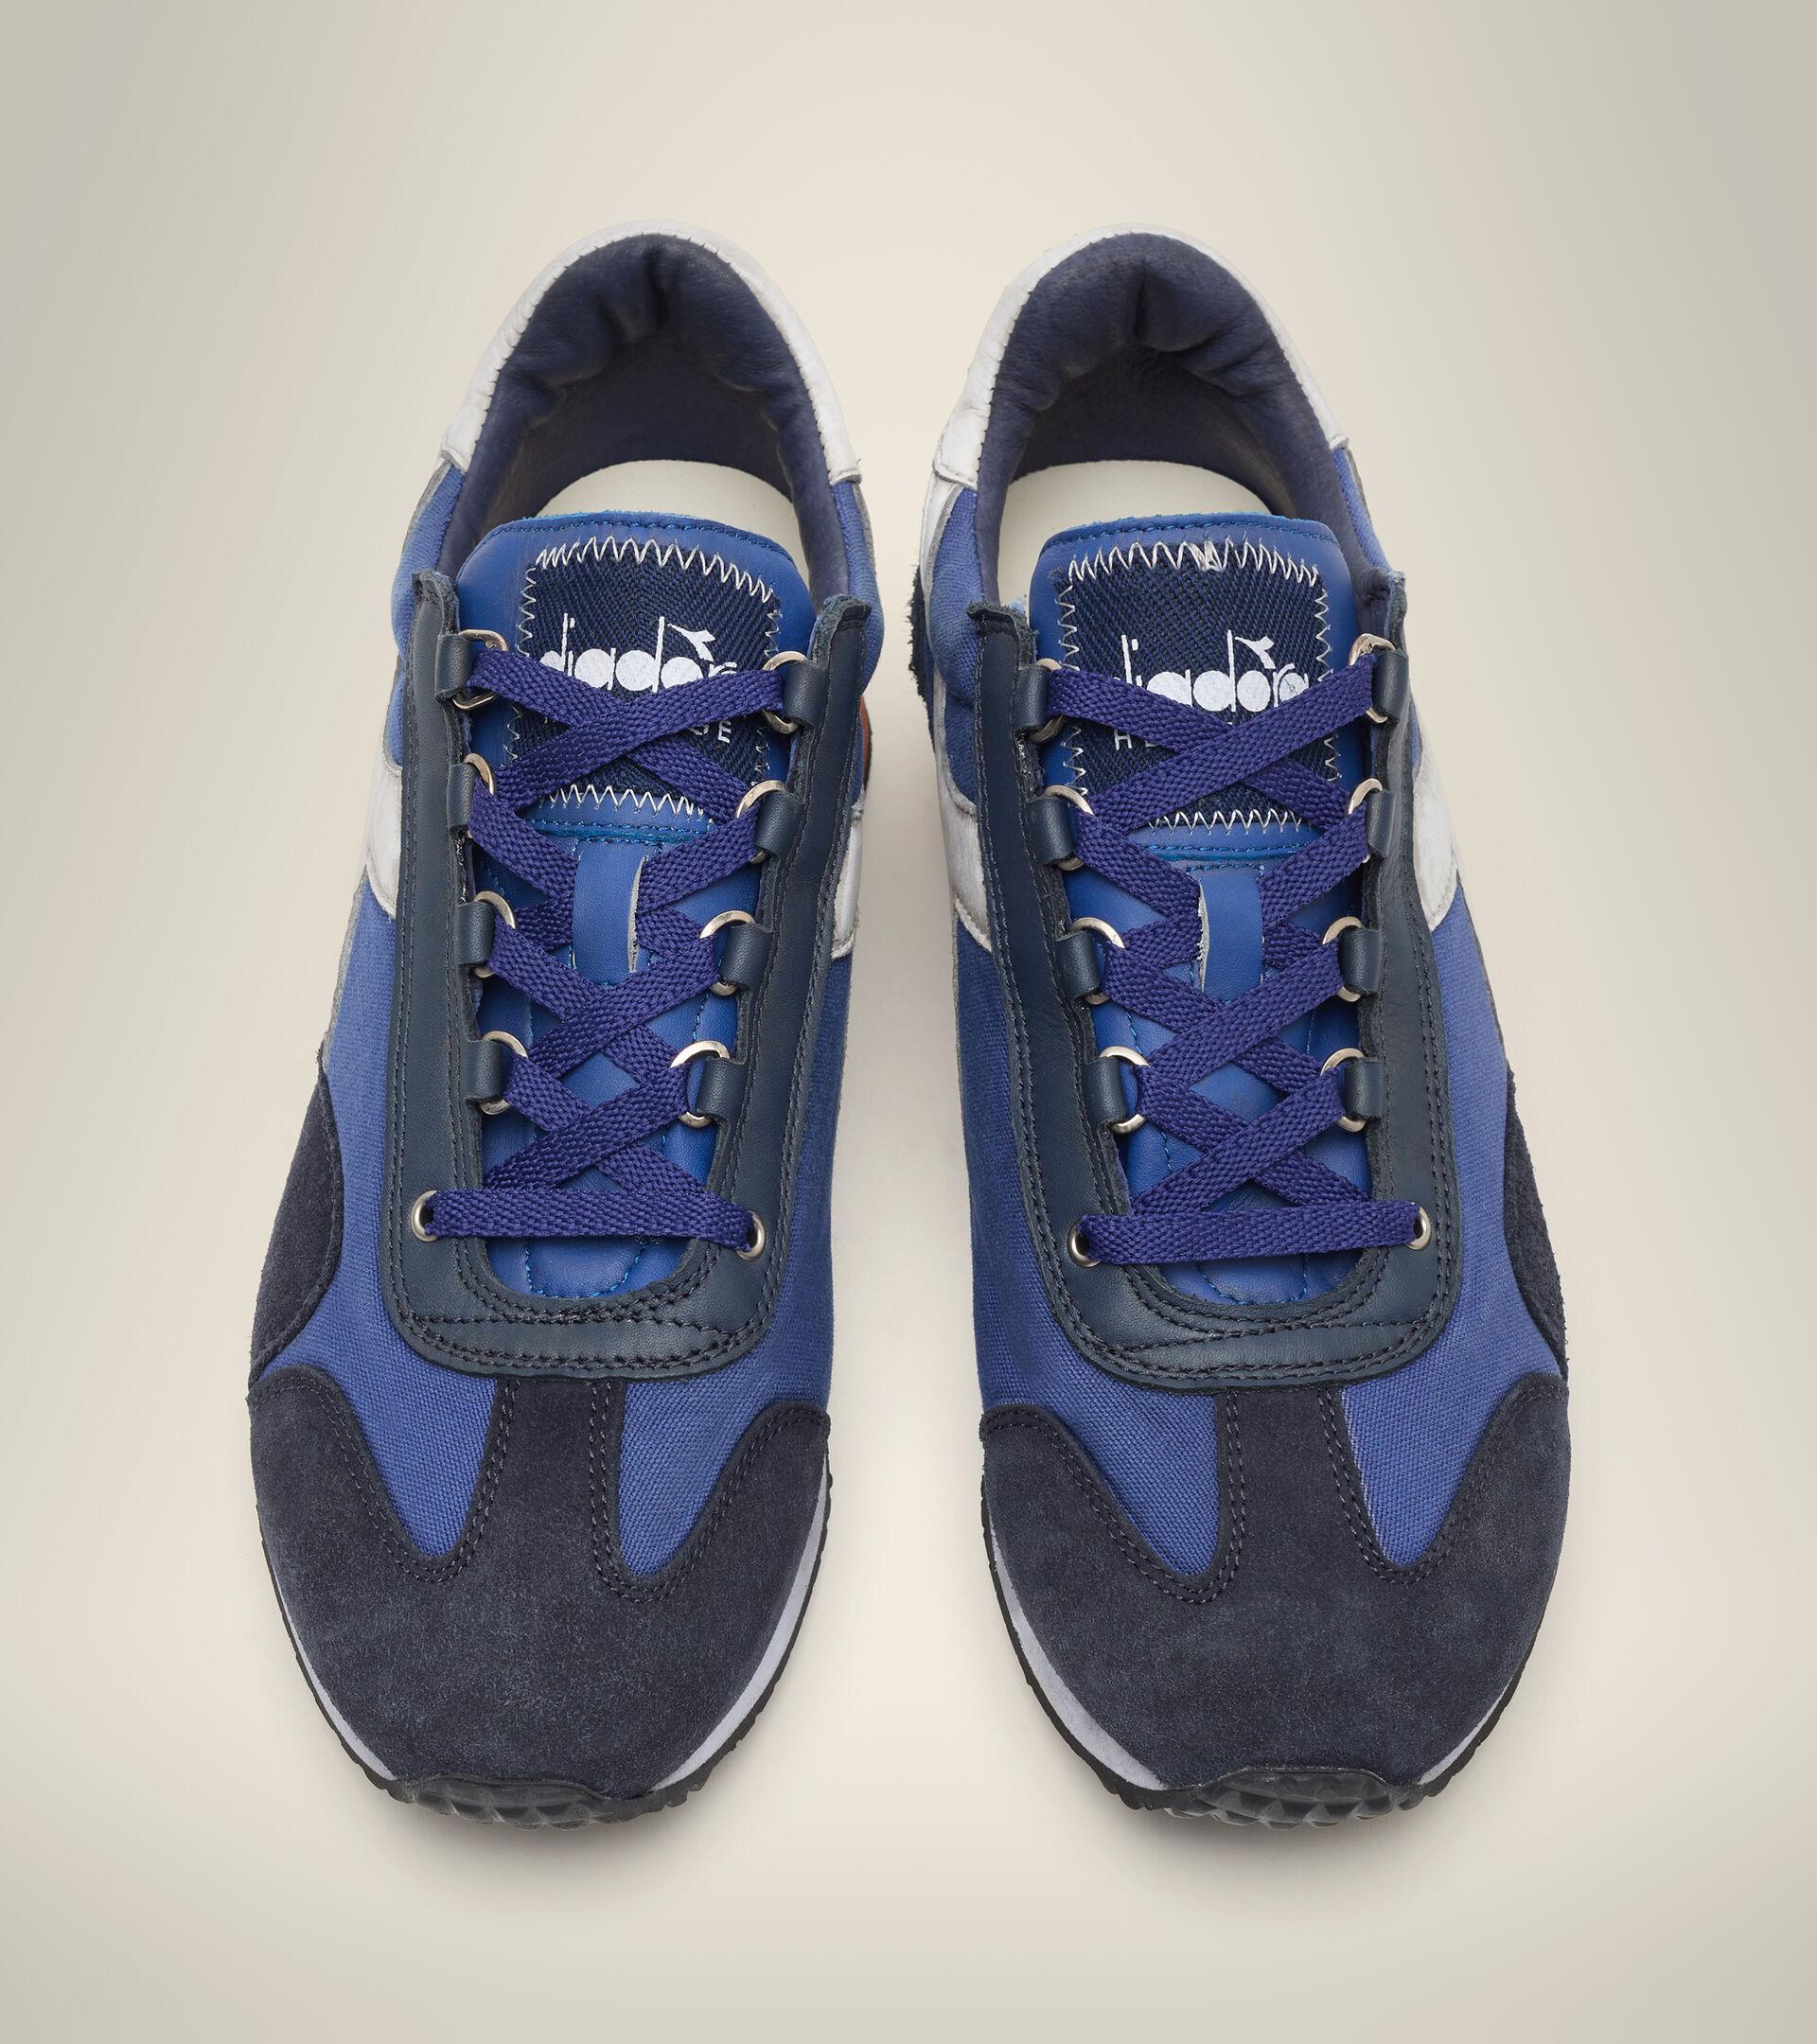 Footwear Heritage UNISEX EQUIPE H DIRTY STONE WASH EVO AZUL LIMOGES Diadora